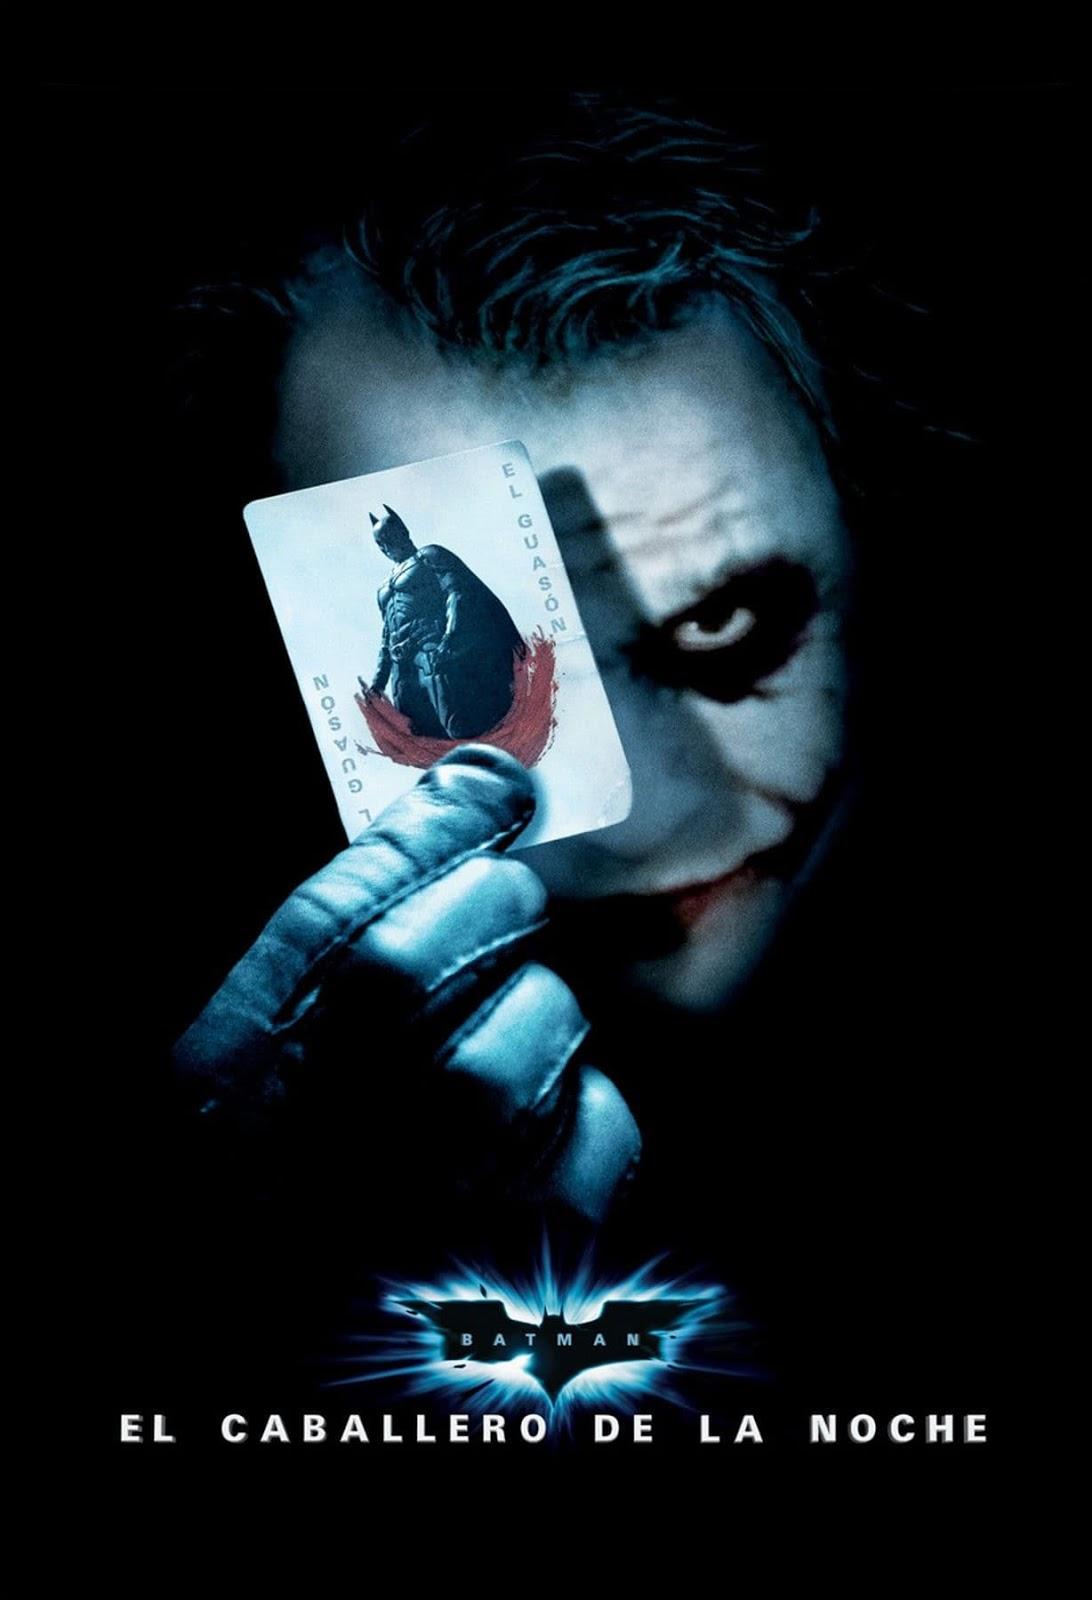 Batman: El caballero de la noche (2008) REMUX 1080p Latino